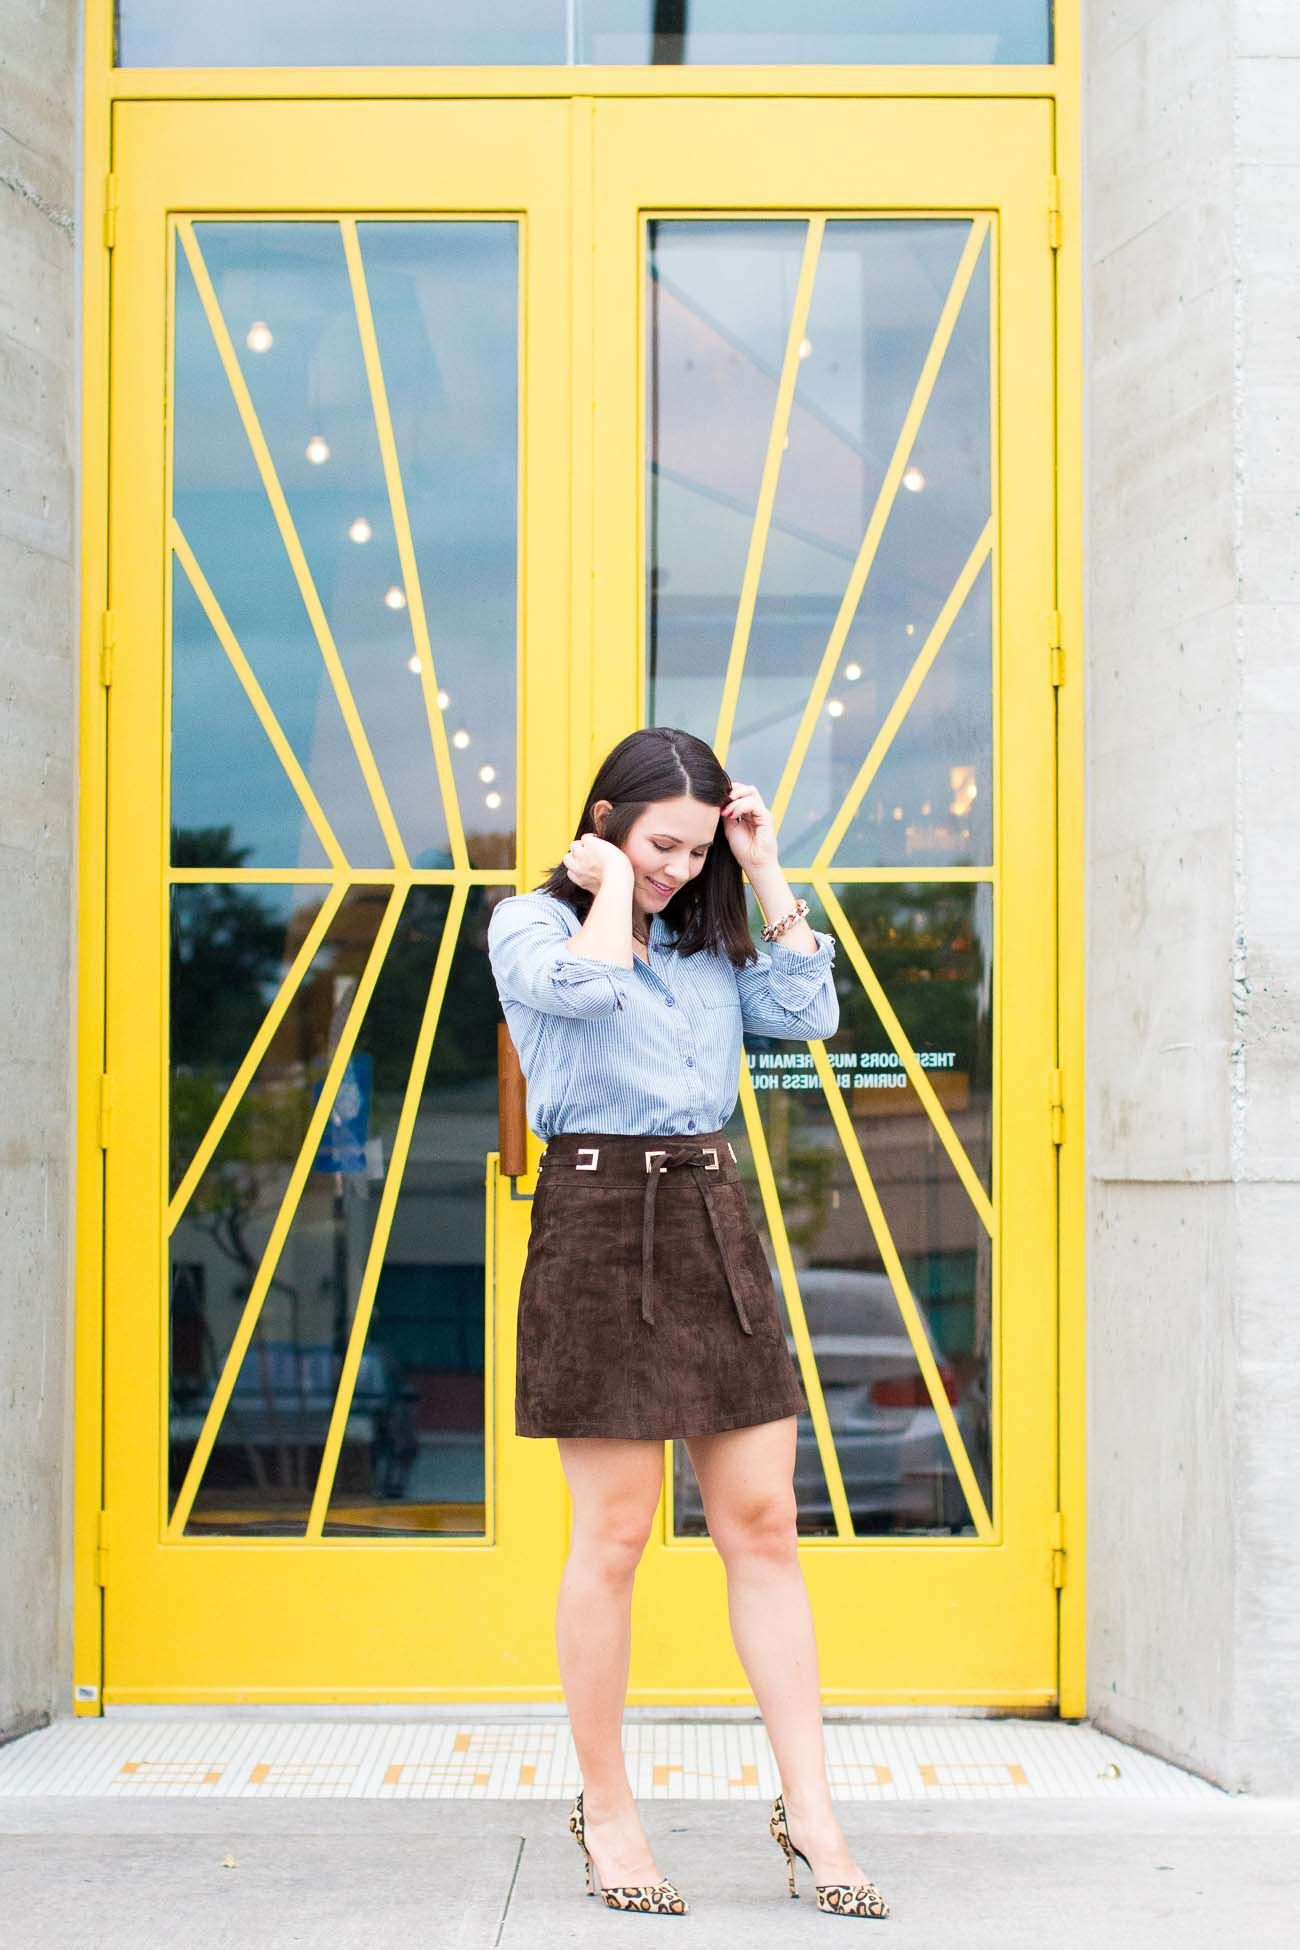 sude mini skirt, how to style a mini skirt - My Style Vita @mystylevita